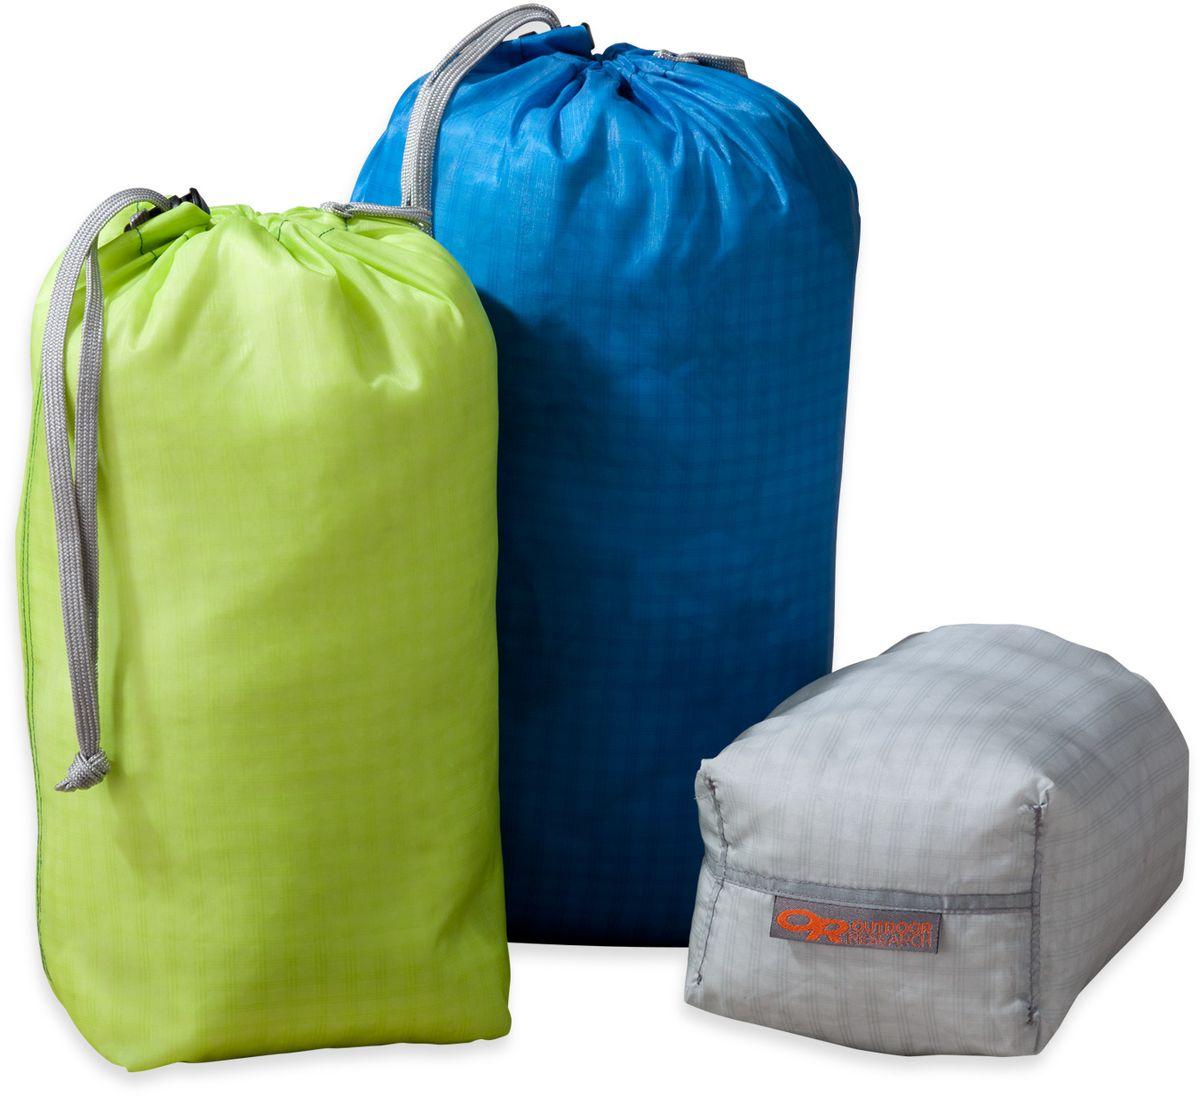 Мешок влагозащитный Outdoor Research Ultralight Ditty Sacks PAK-3, цвет: желтый, синий, серый, 3 шт